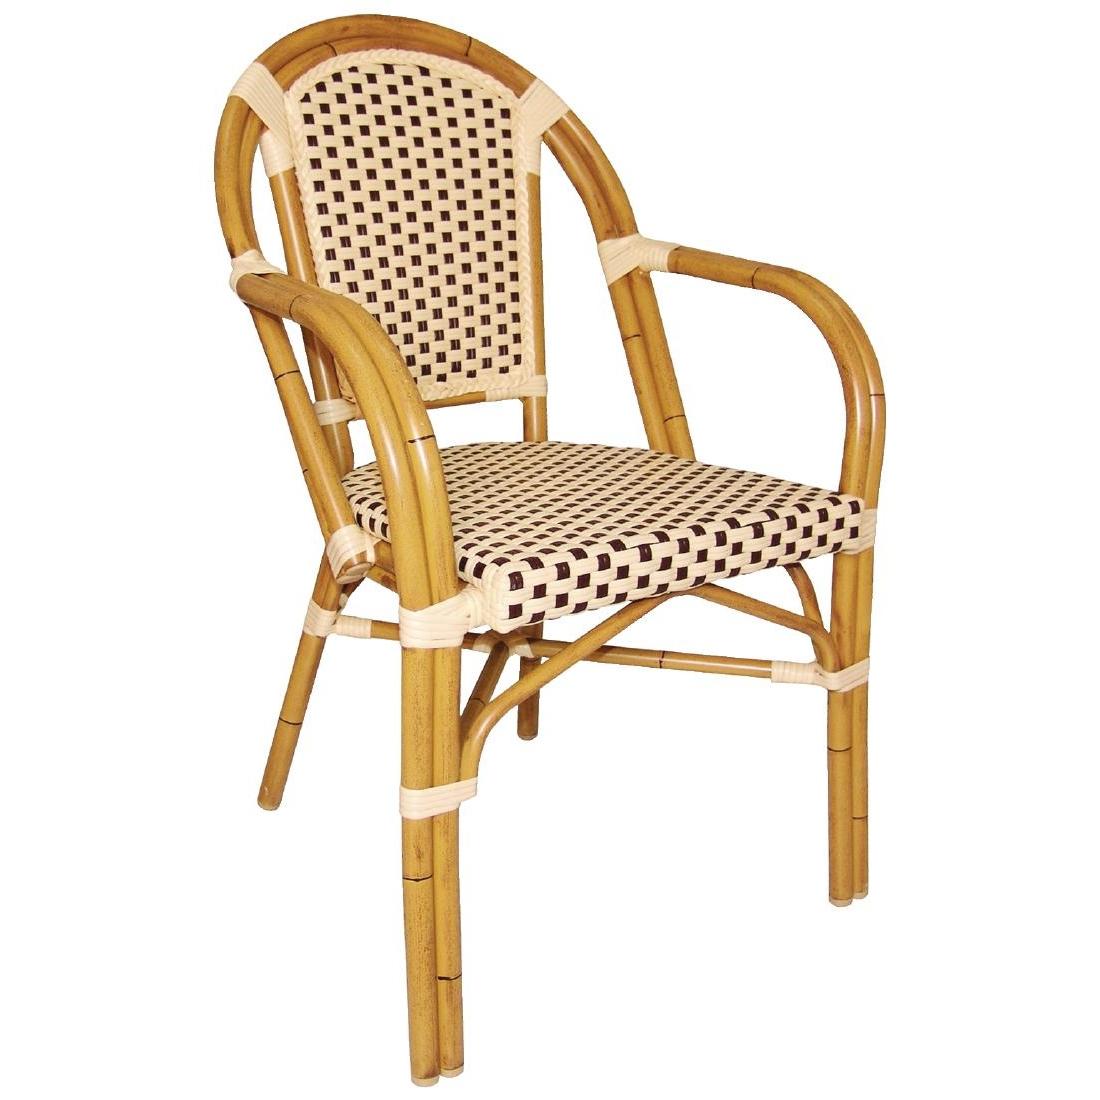 outdoor bistrostuhl krista 365st a braun creme g nstig kaufen m bel star. Black Bedroom Furniture Sets. Home Design Ideas